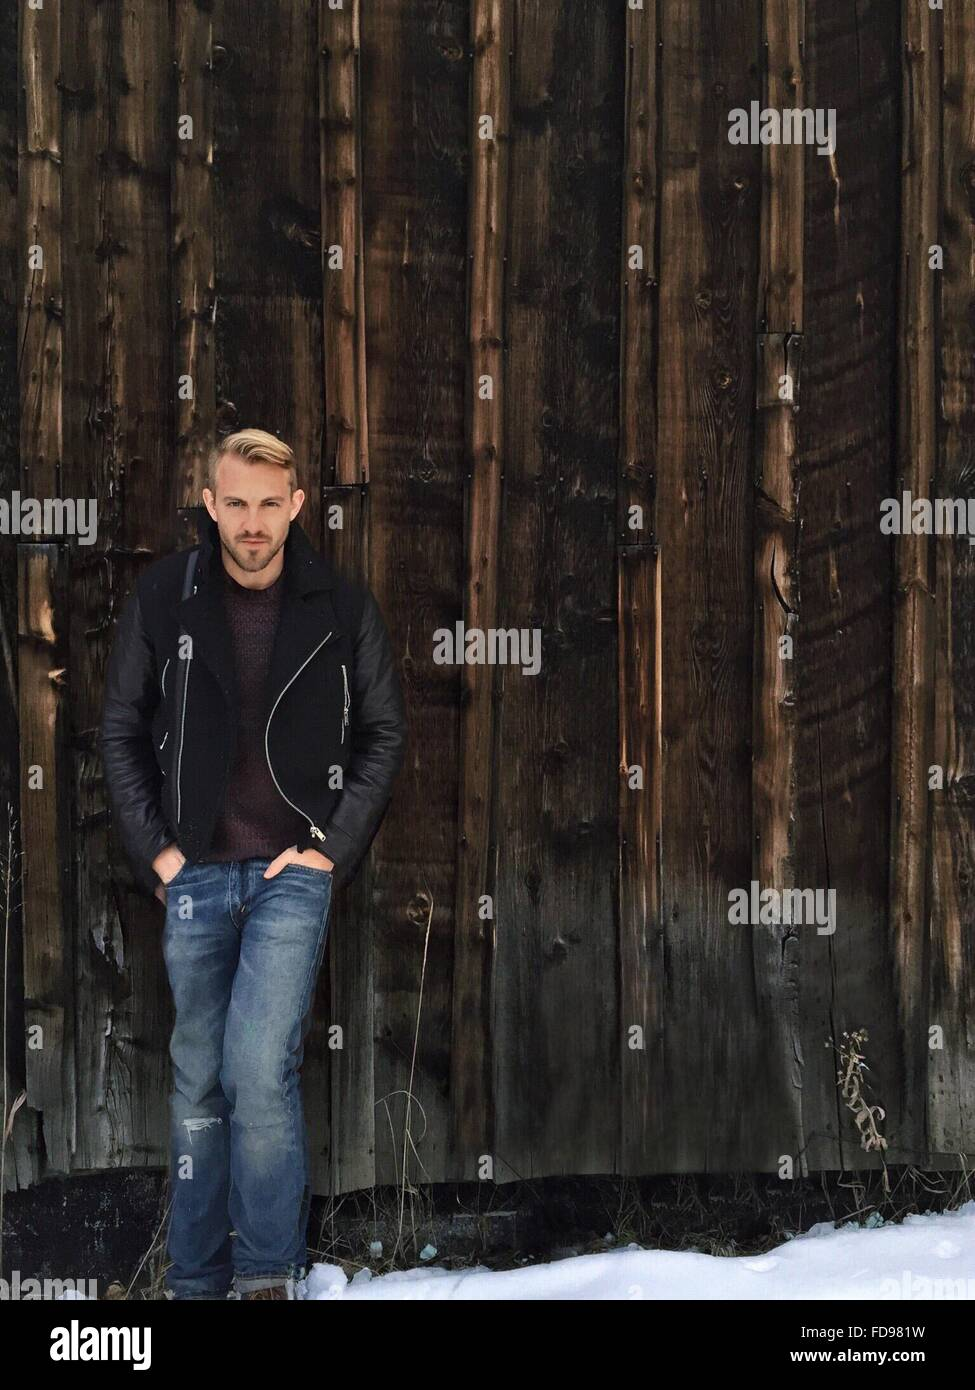 Full Length Portrait of Young Man Standing On Snowy Landscape contre mur en bois Photo Stock